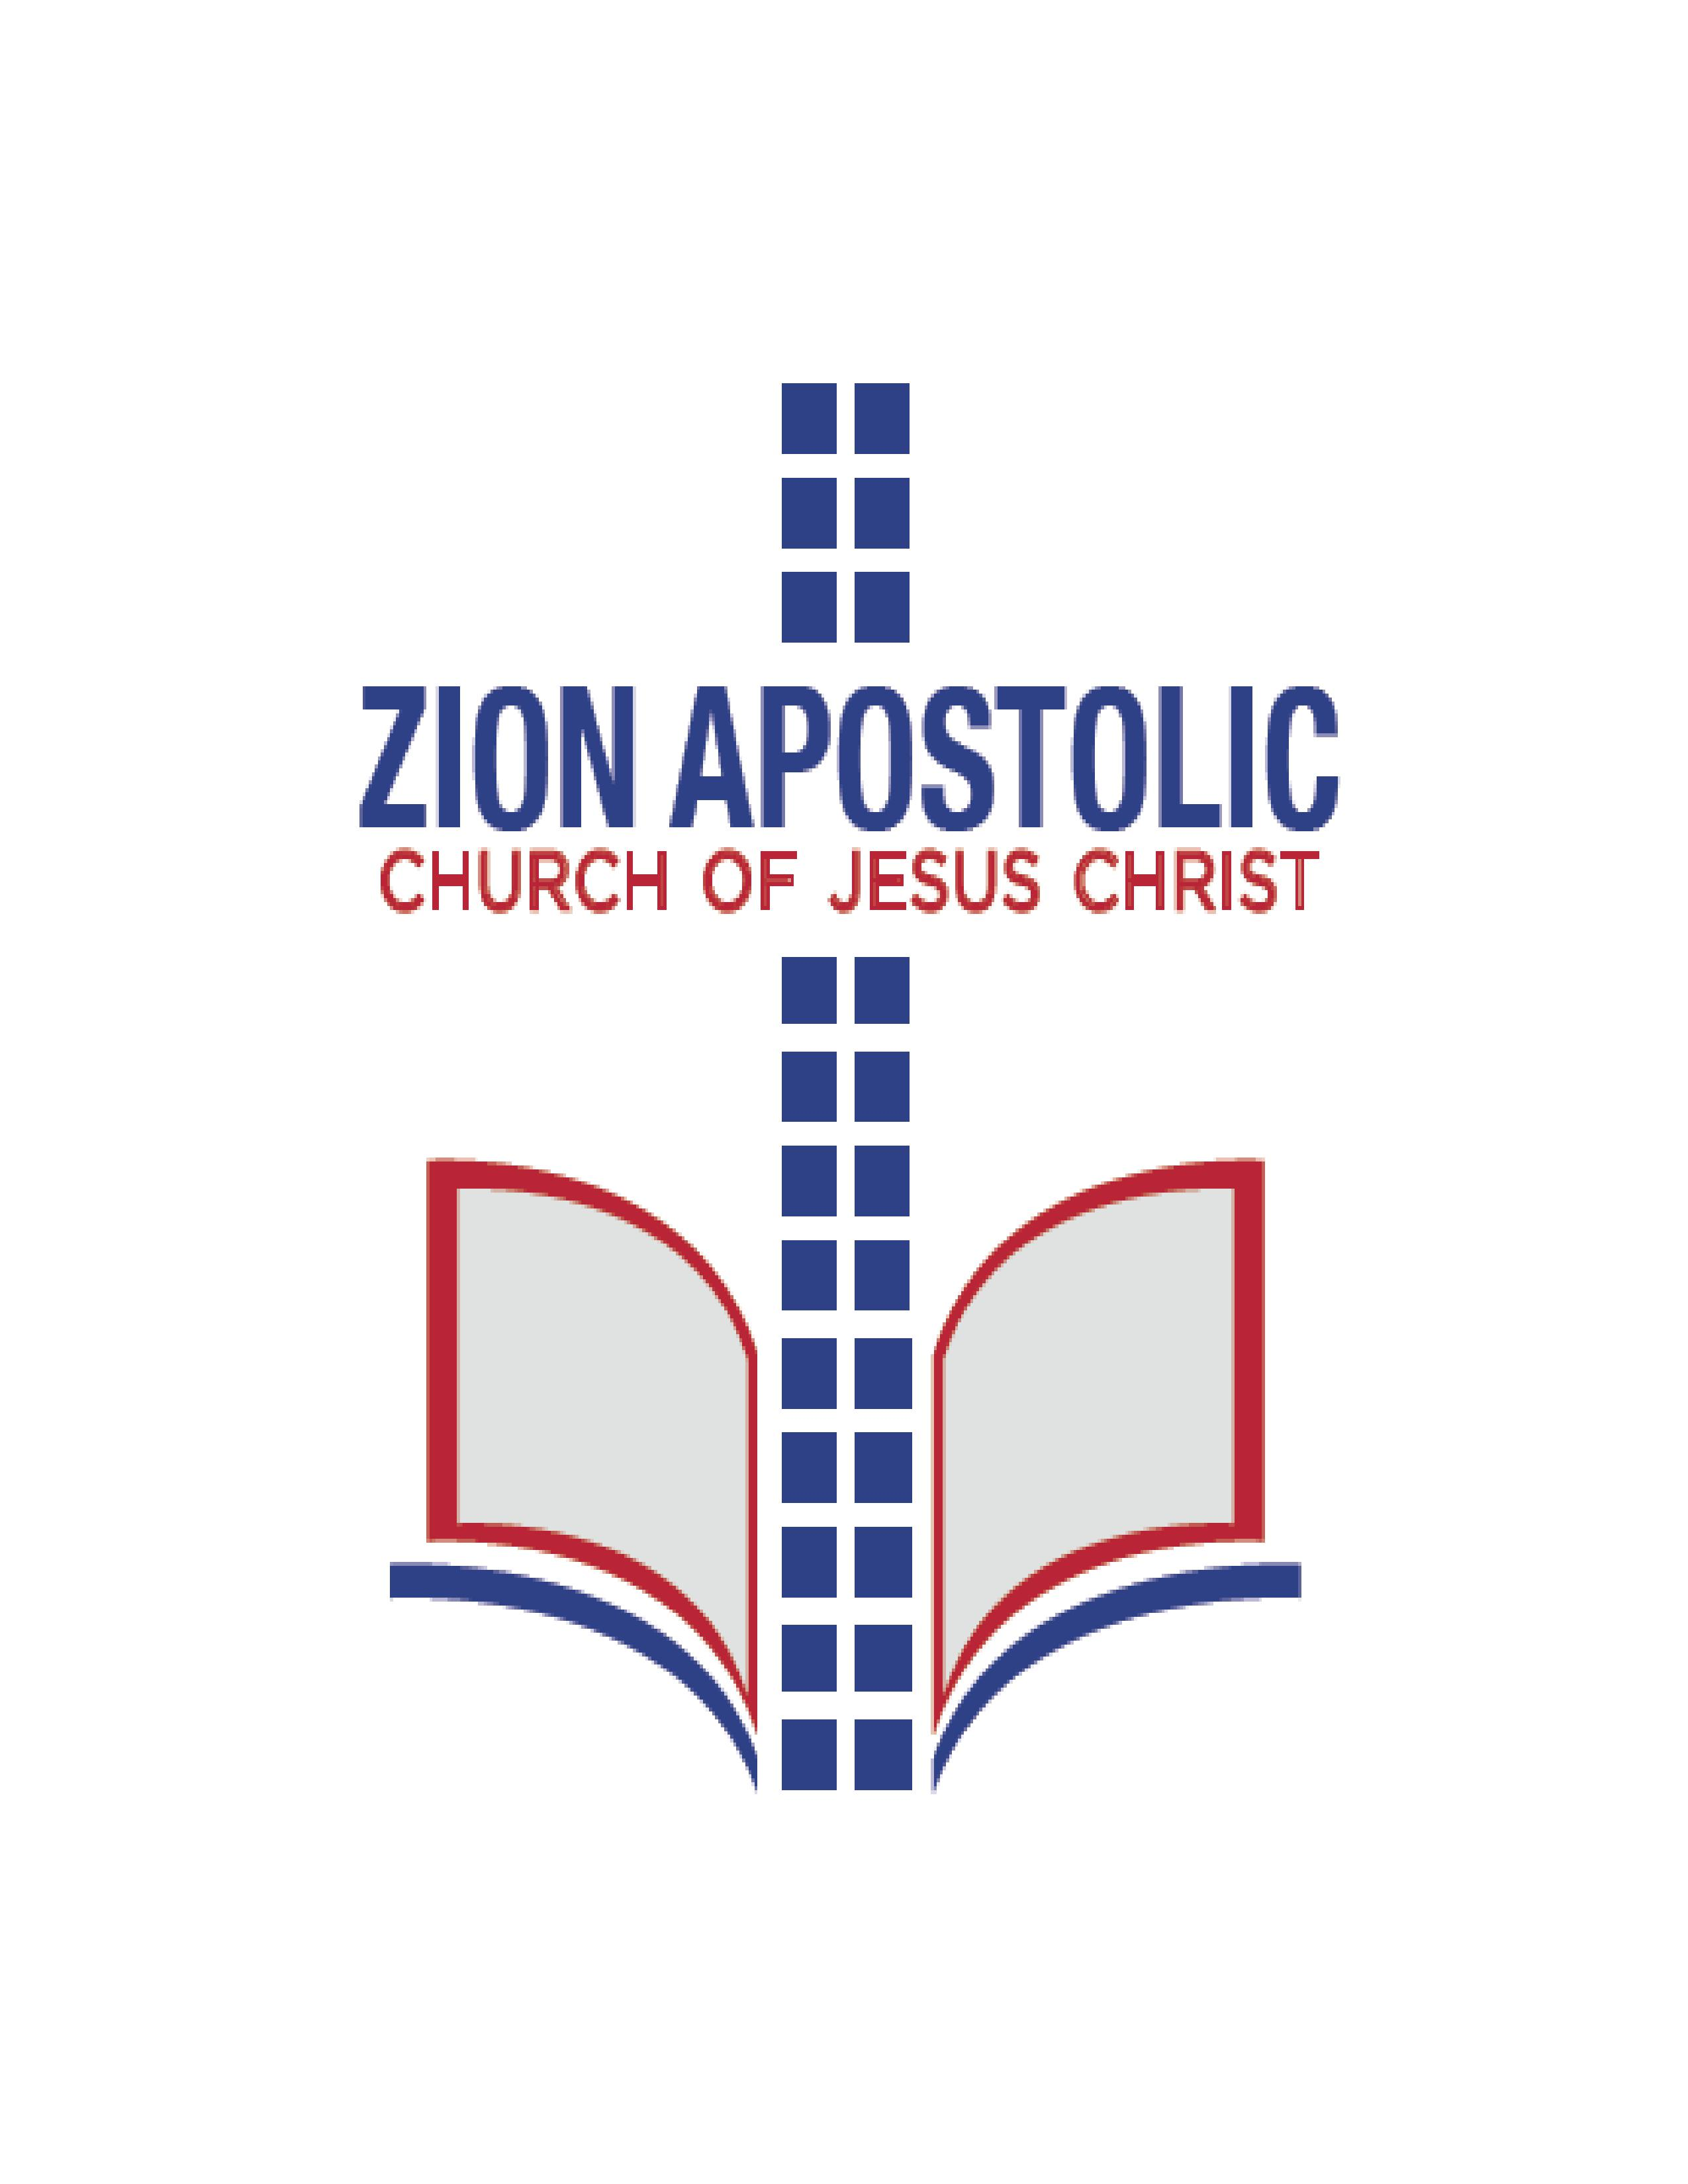 Zion Apostolic